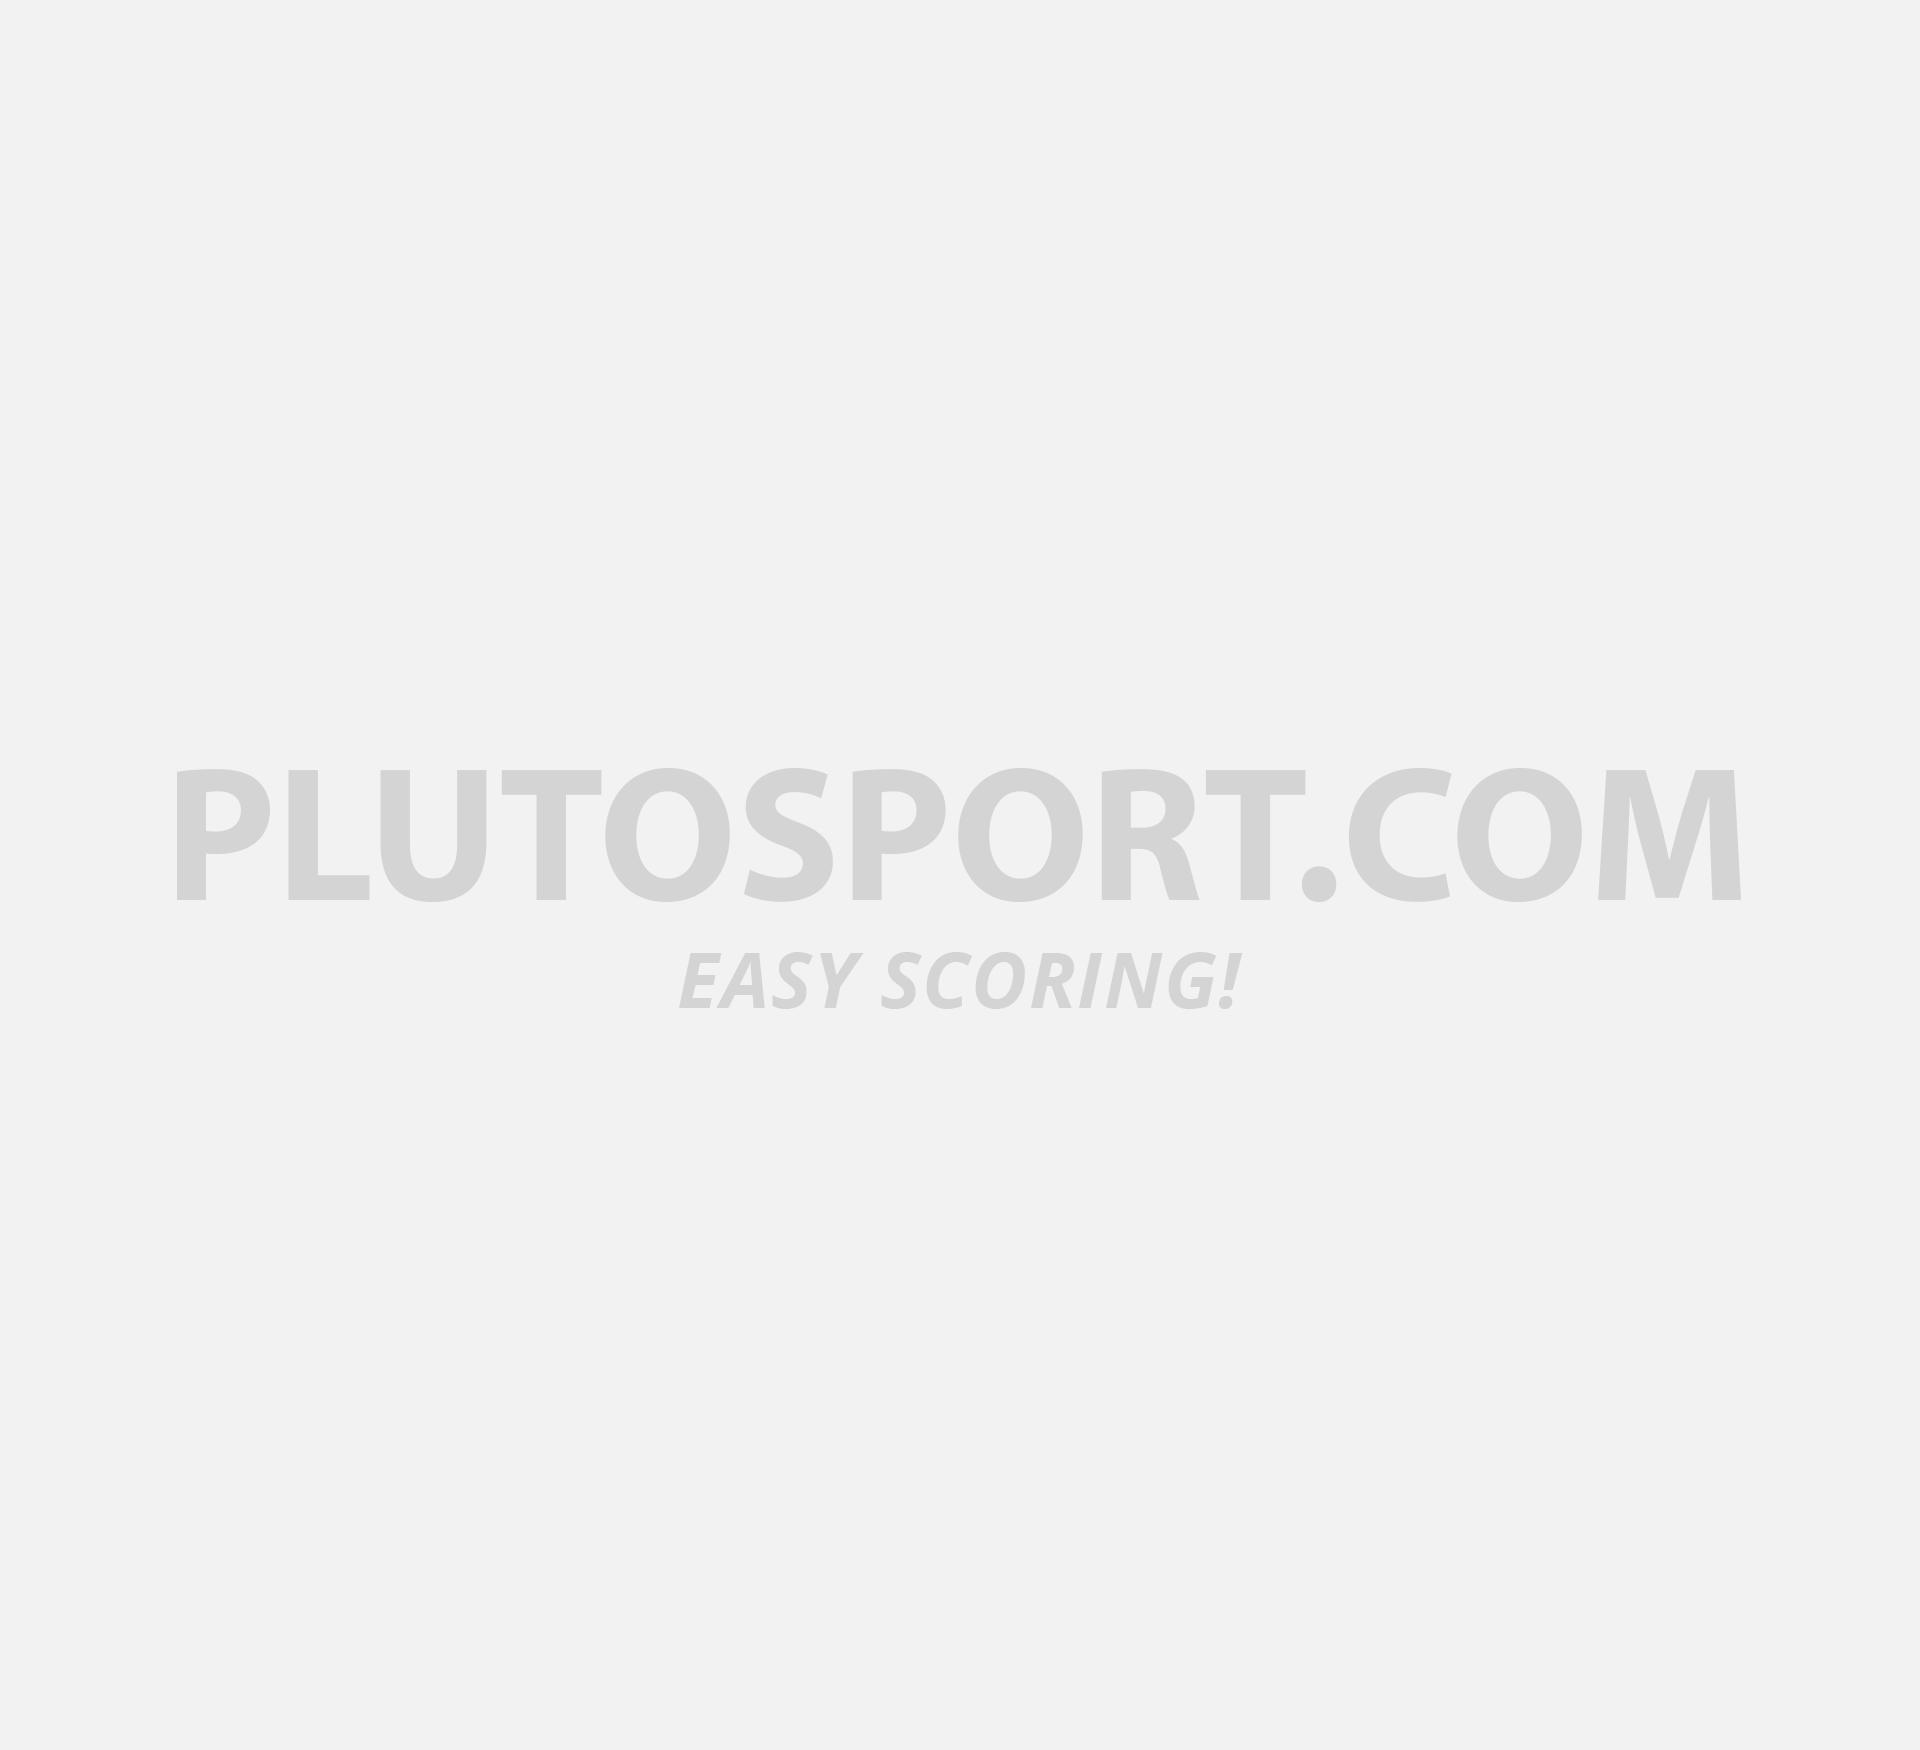 700a6b52311 Puma Carson Mesh Junior - Sneakers - Shoes - Lifestyle - Sports ...